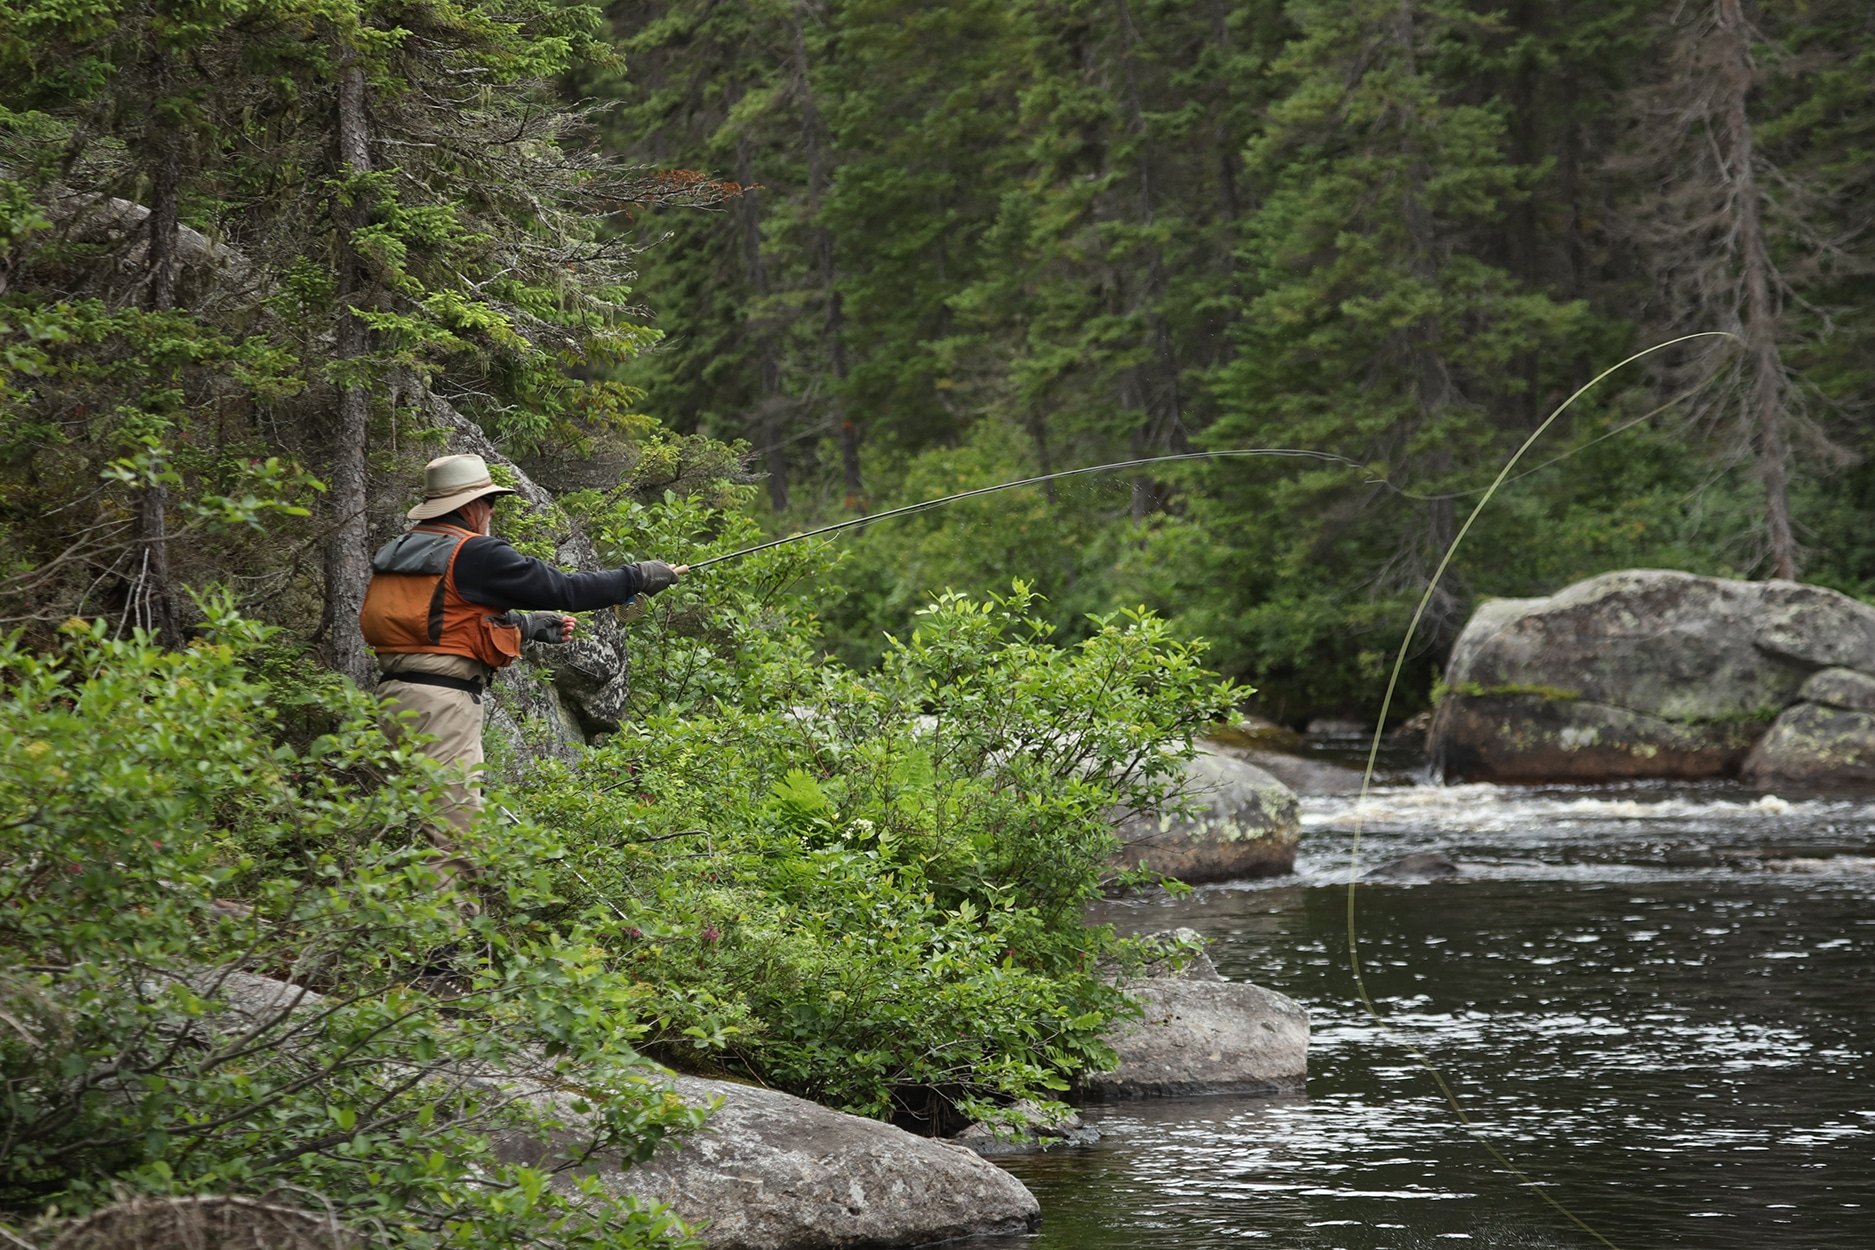 La pêche au saumon sur la rivière Miramichi